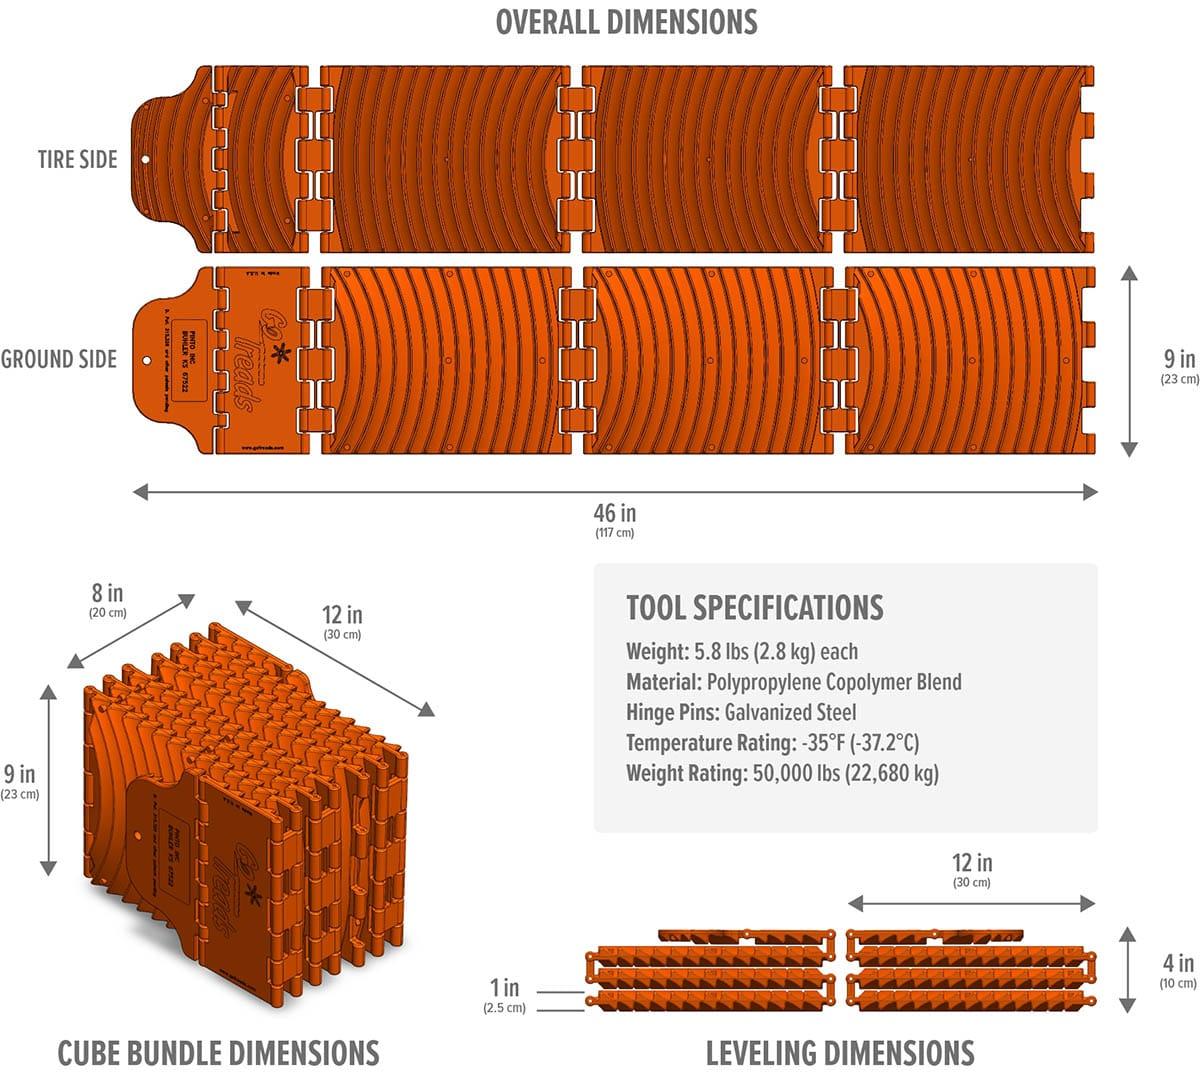 Standard GoTreads Dimensions